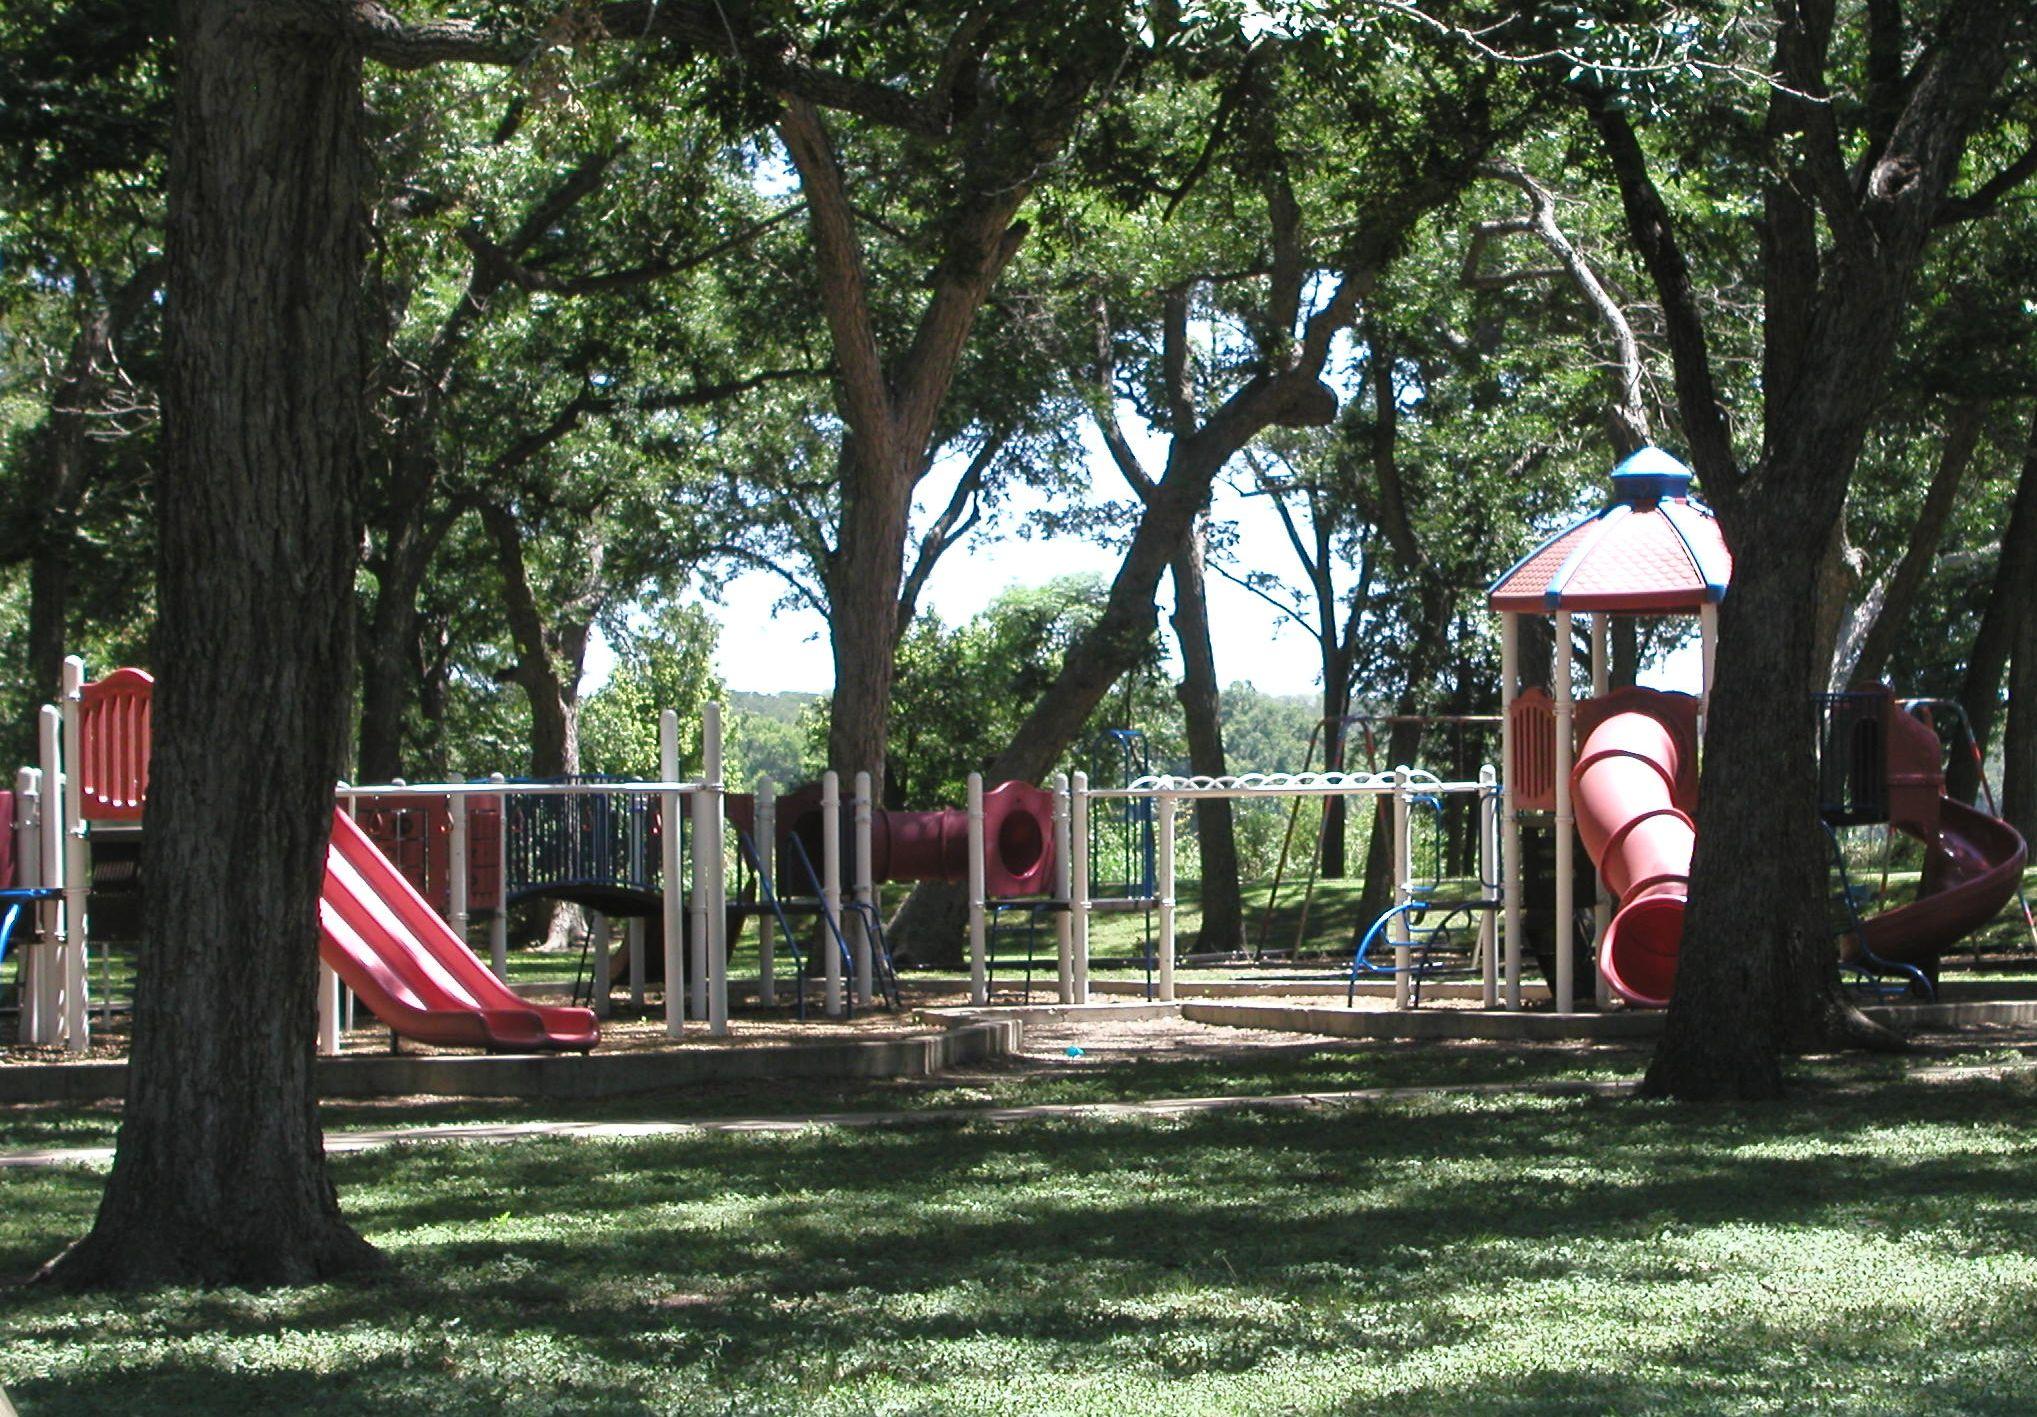 Temple Lions Park Playbround